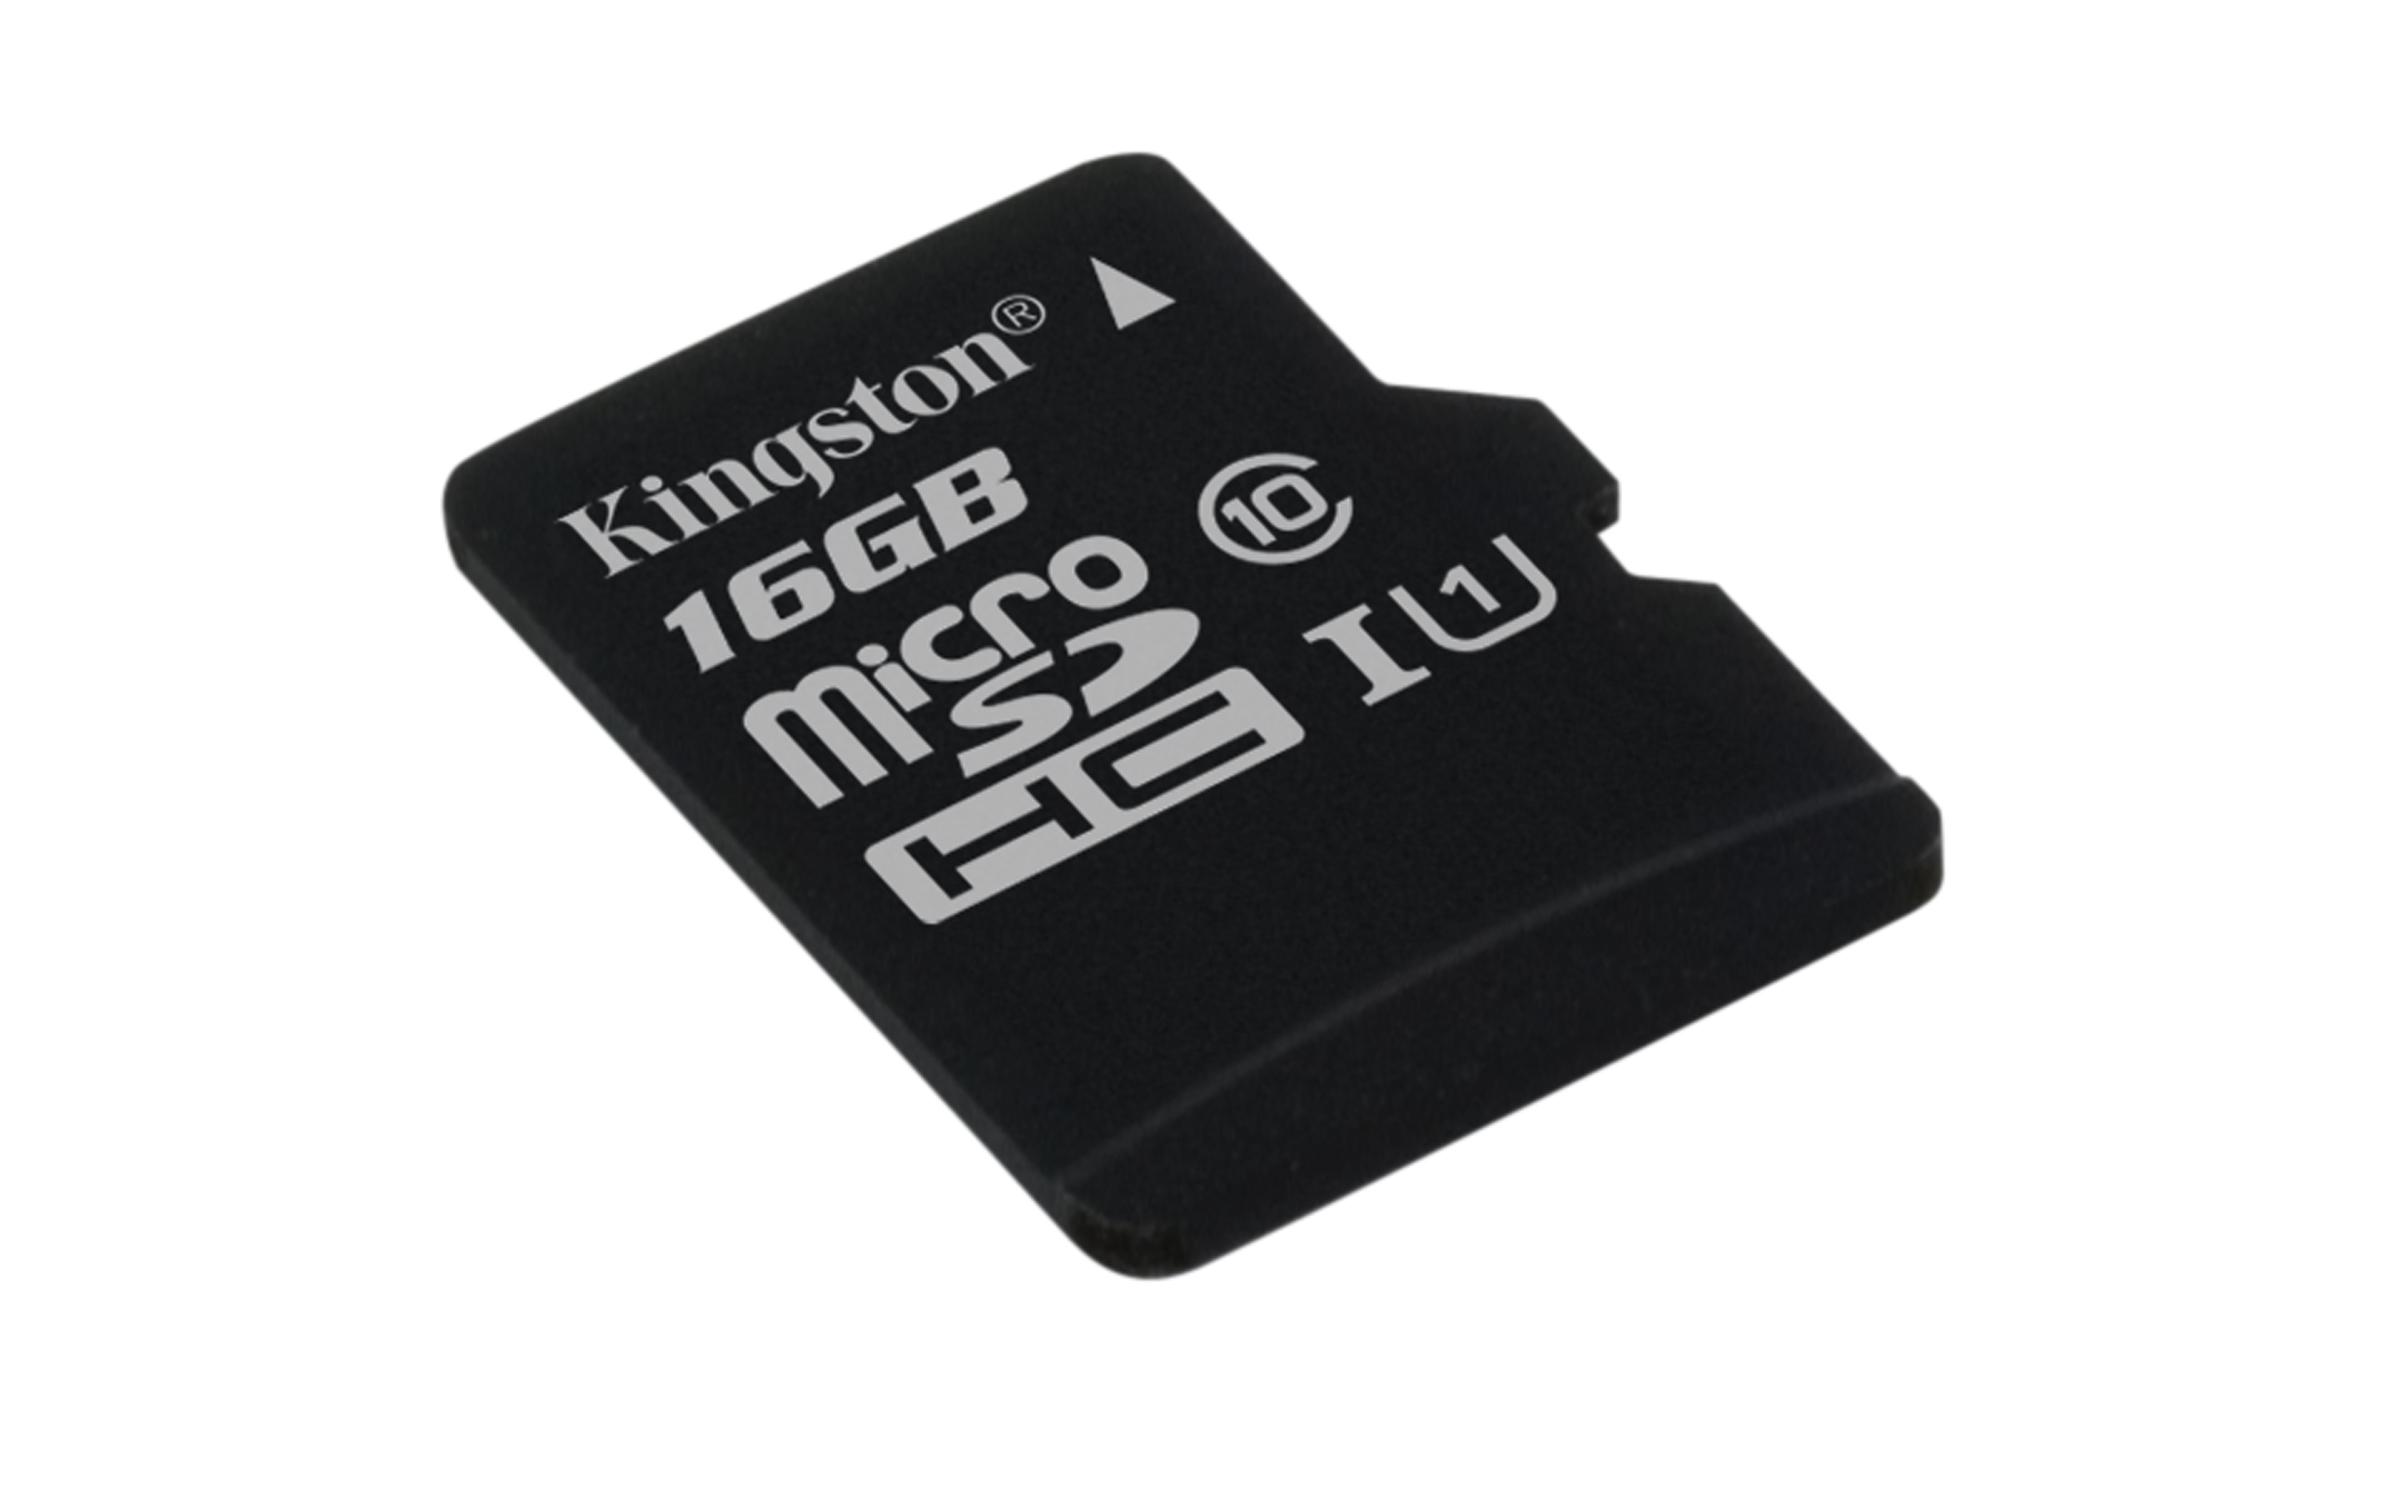 Paměťová karta KINGSTON 16GB Micro SDHC, class 10 45R/10W (bez adaptéru)